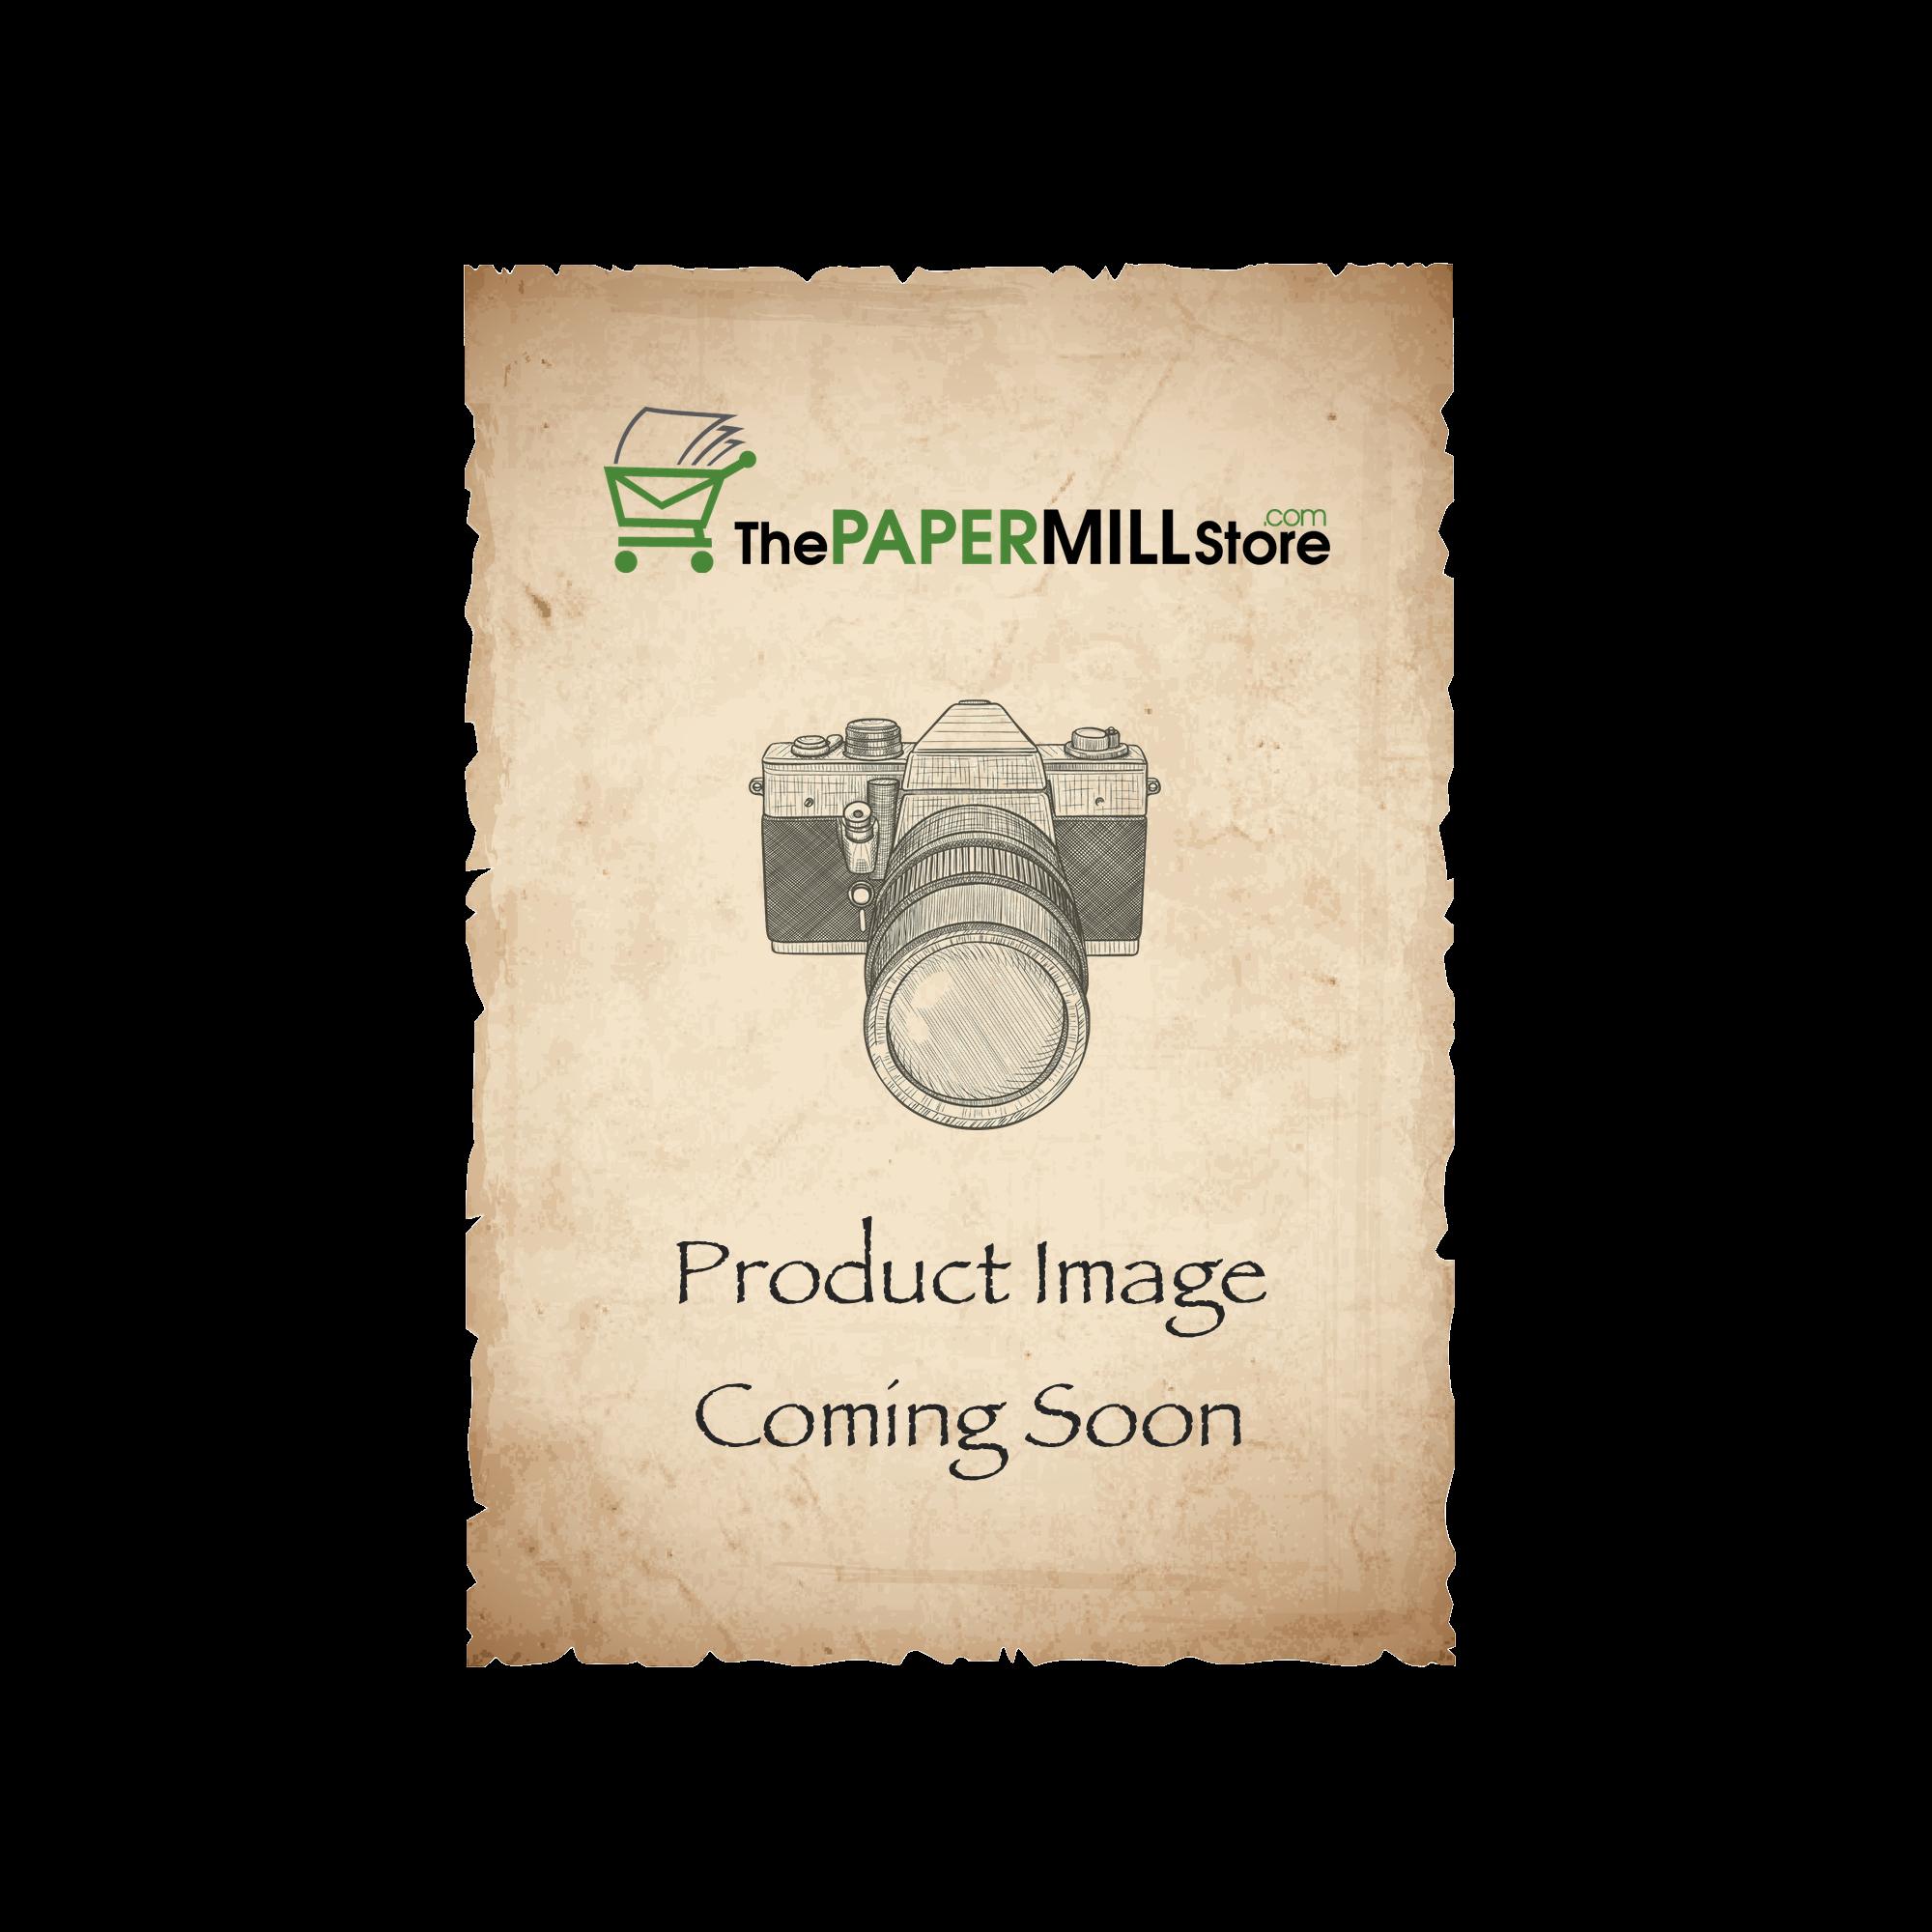 ASPIRE Petallics Beargrass Card Stock - 26 x 40 in 98 lb Cover Linen C/2S  30% Recycled 300 per Carton